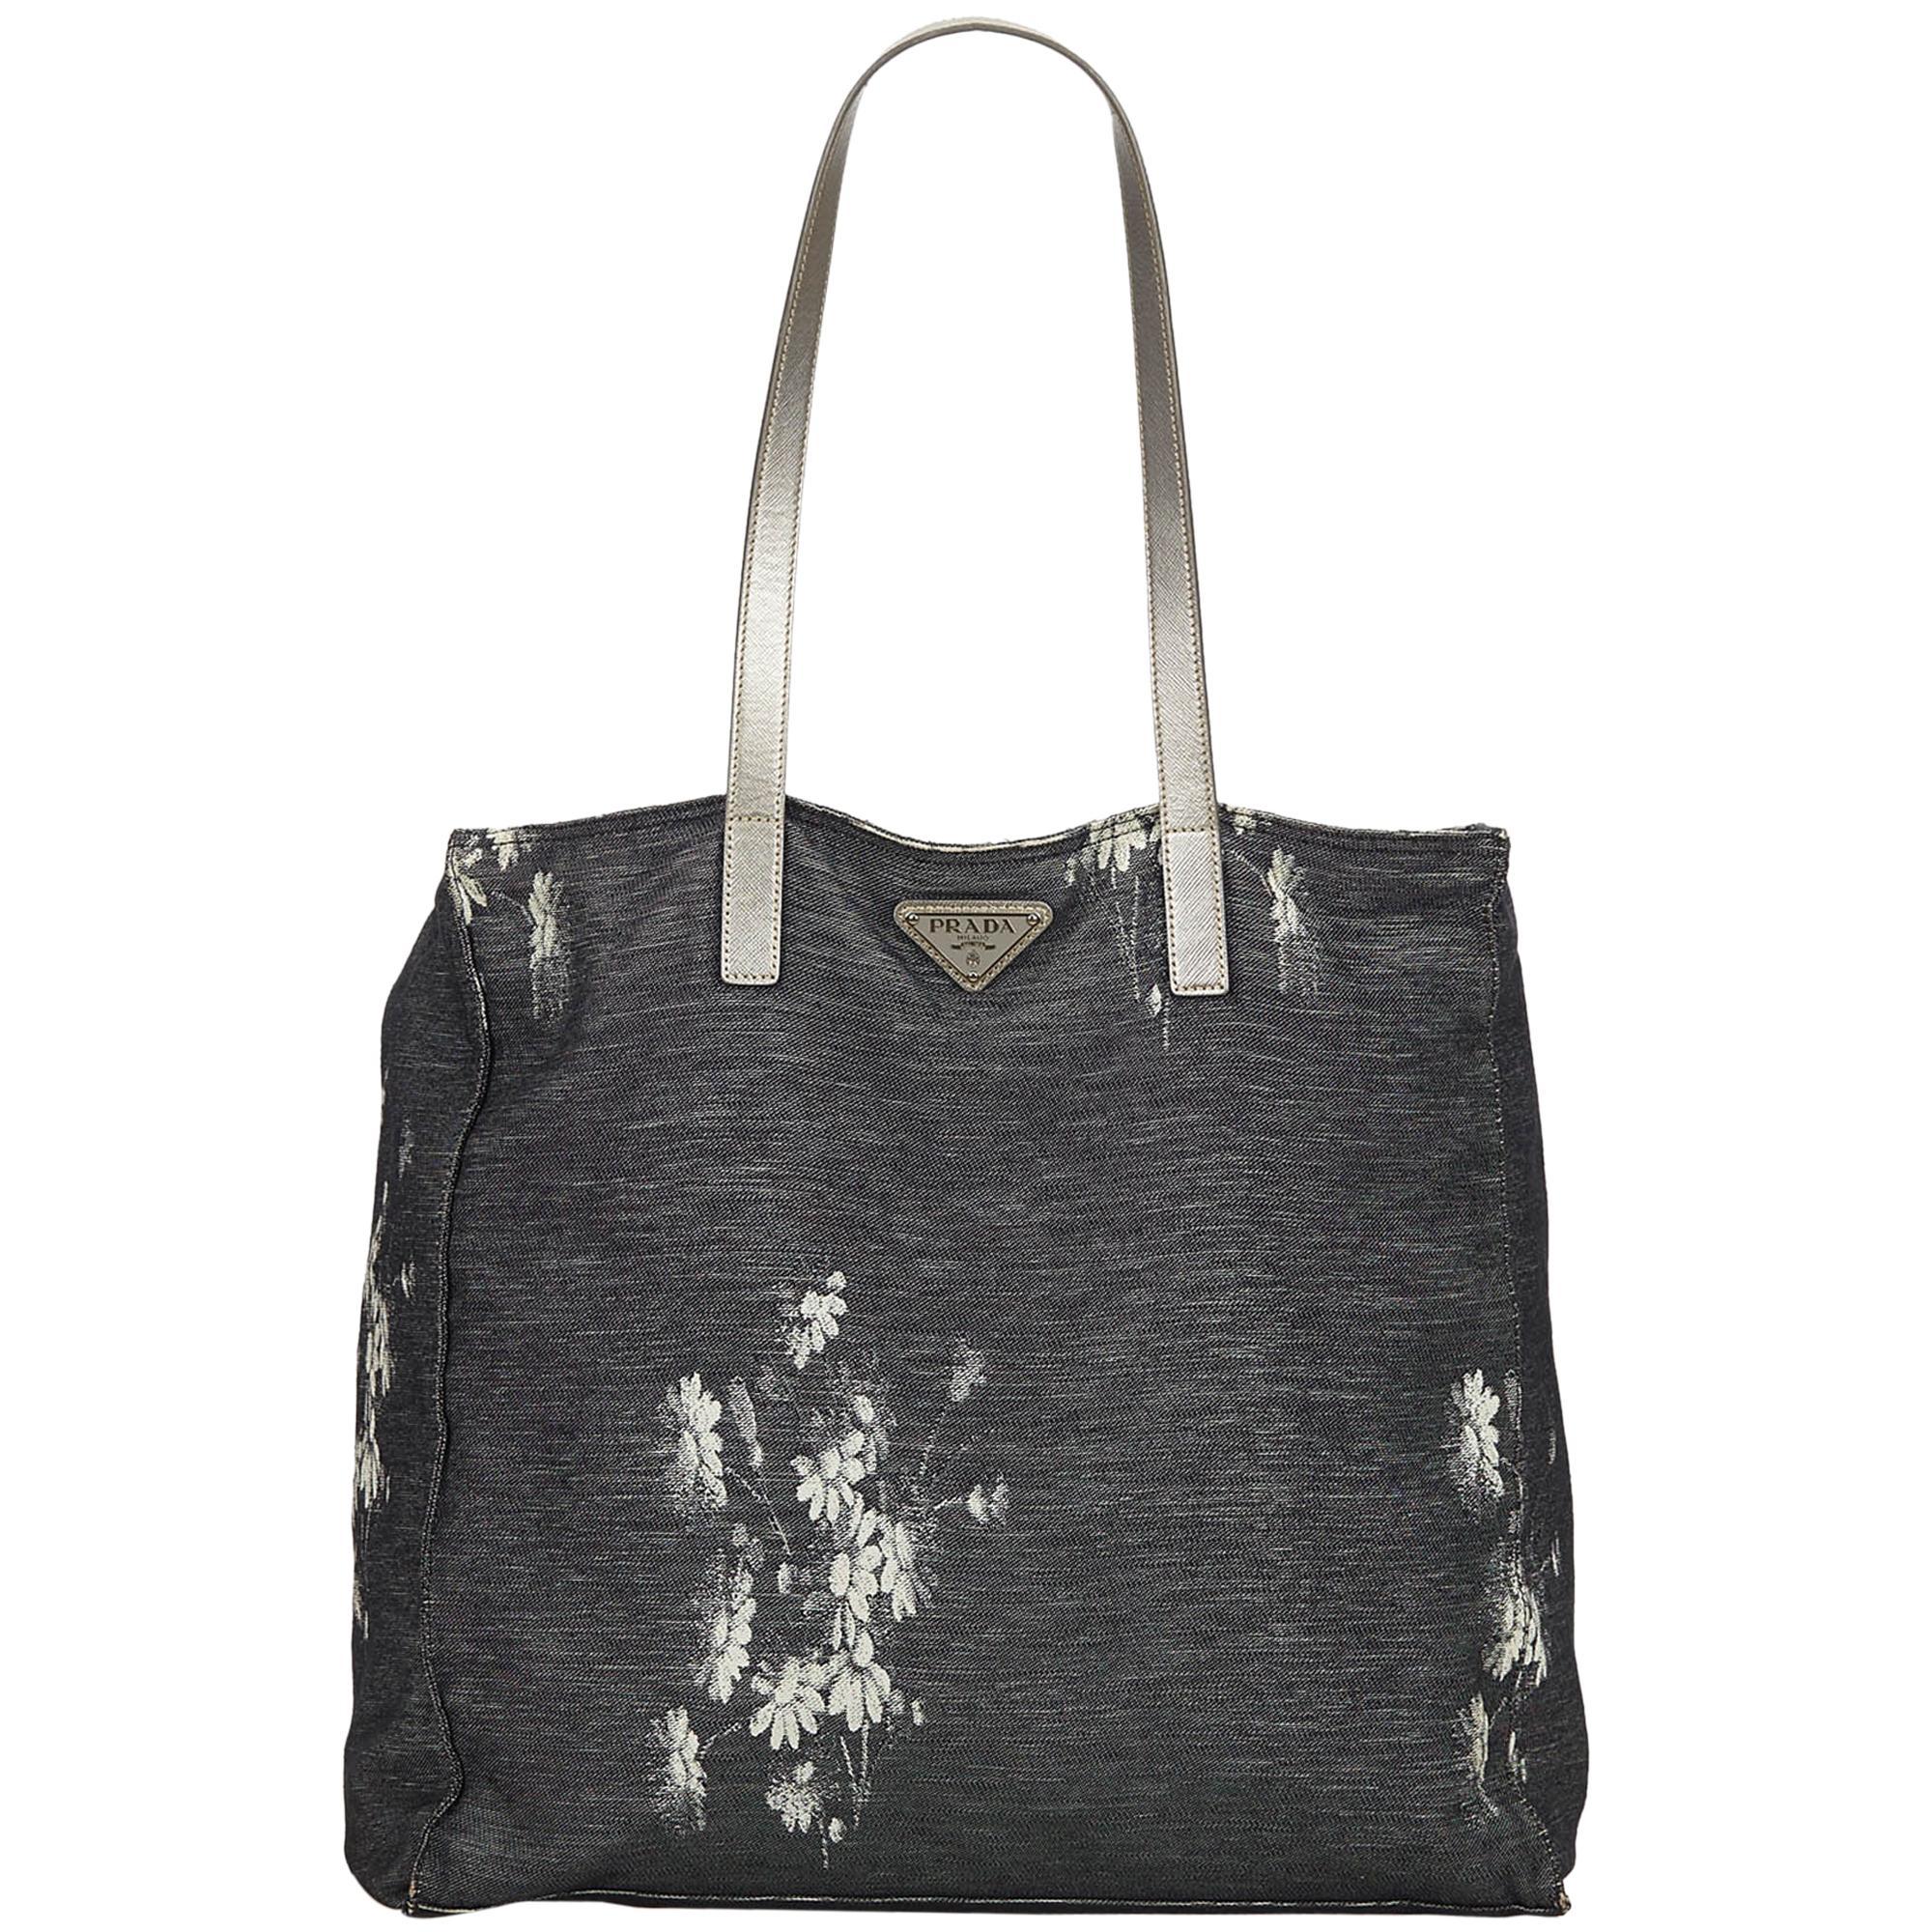 1e413466882 ... canvas tote bag for sale 454e5 6770f coupon prada double bag review  895f7 0ea3c purchase prada vitello phenix baltico navy pattina shoulder  messenger ...